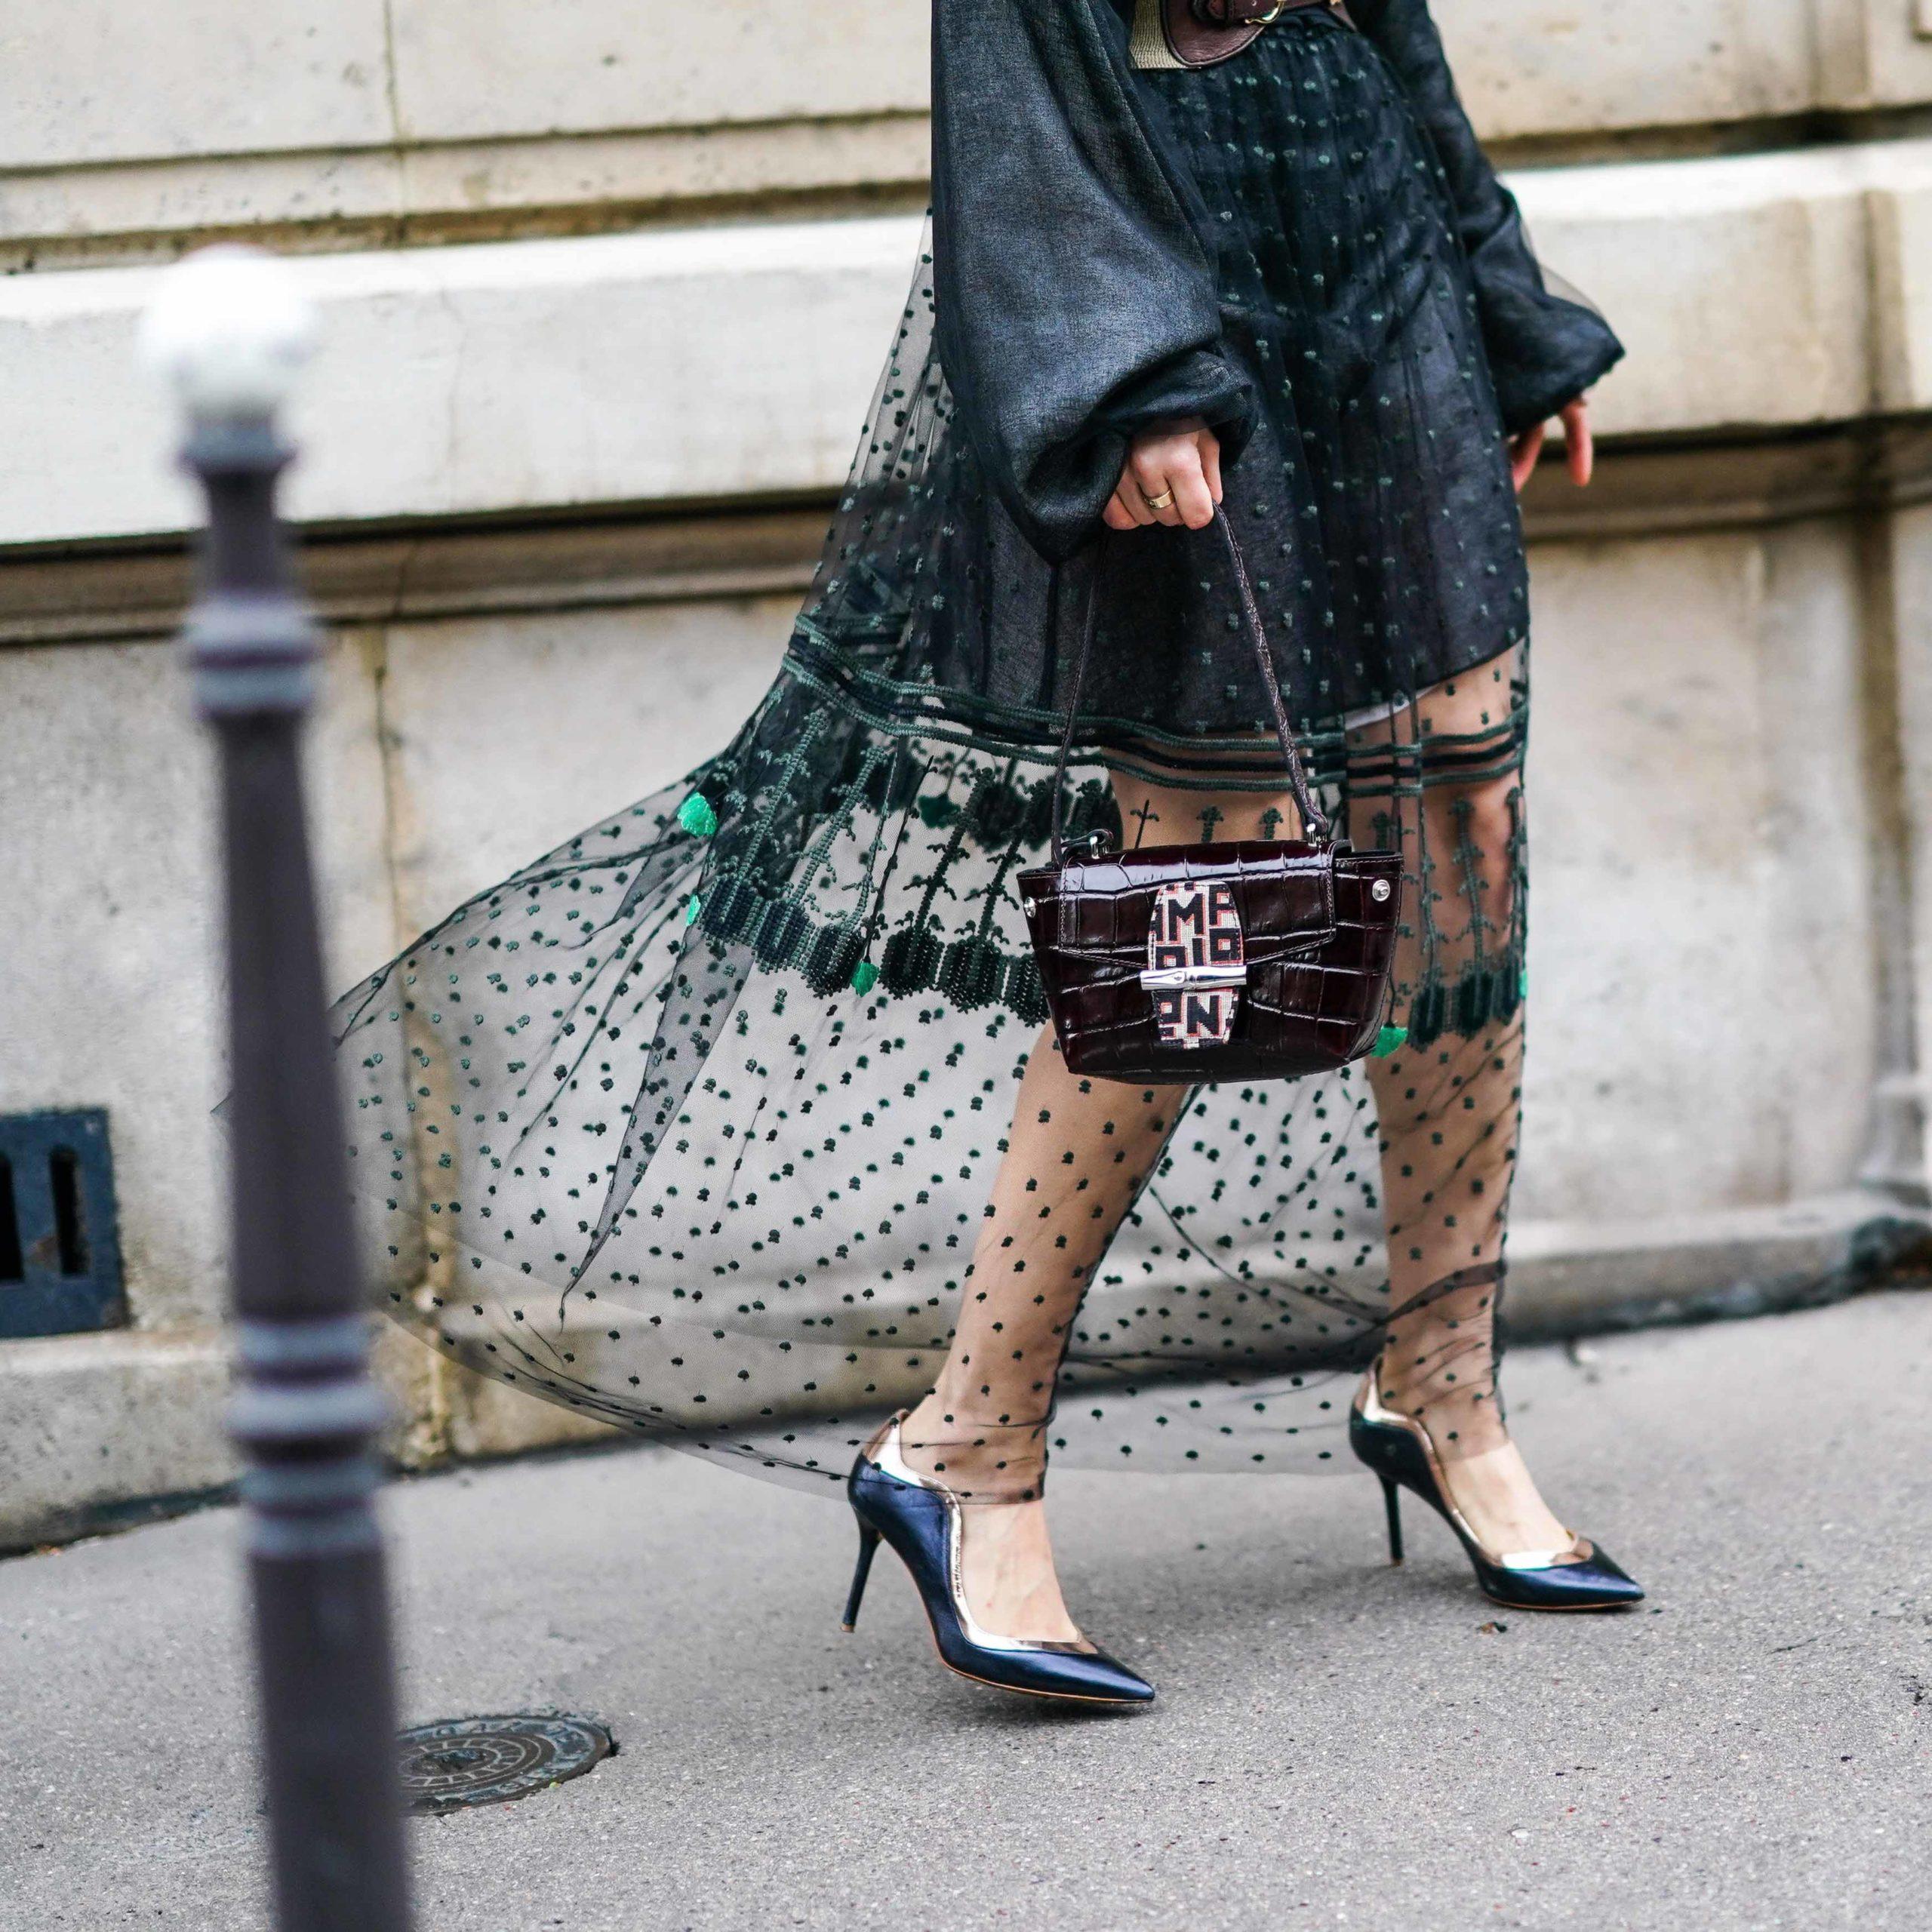 Holiday dress 2020 lace dress longchamp bag longchamp pumps malone souliers